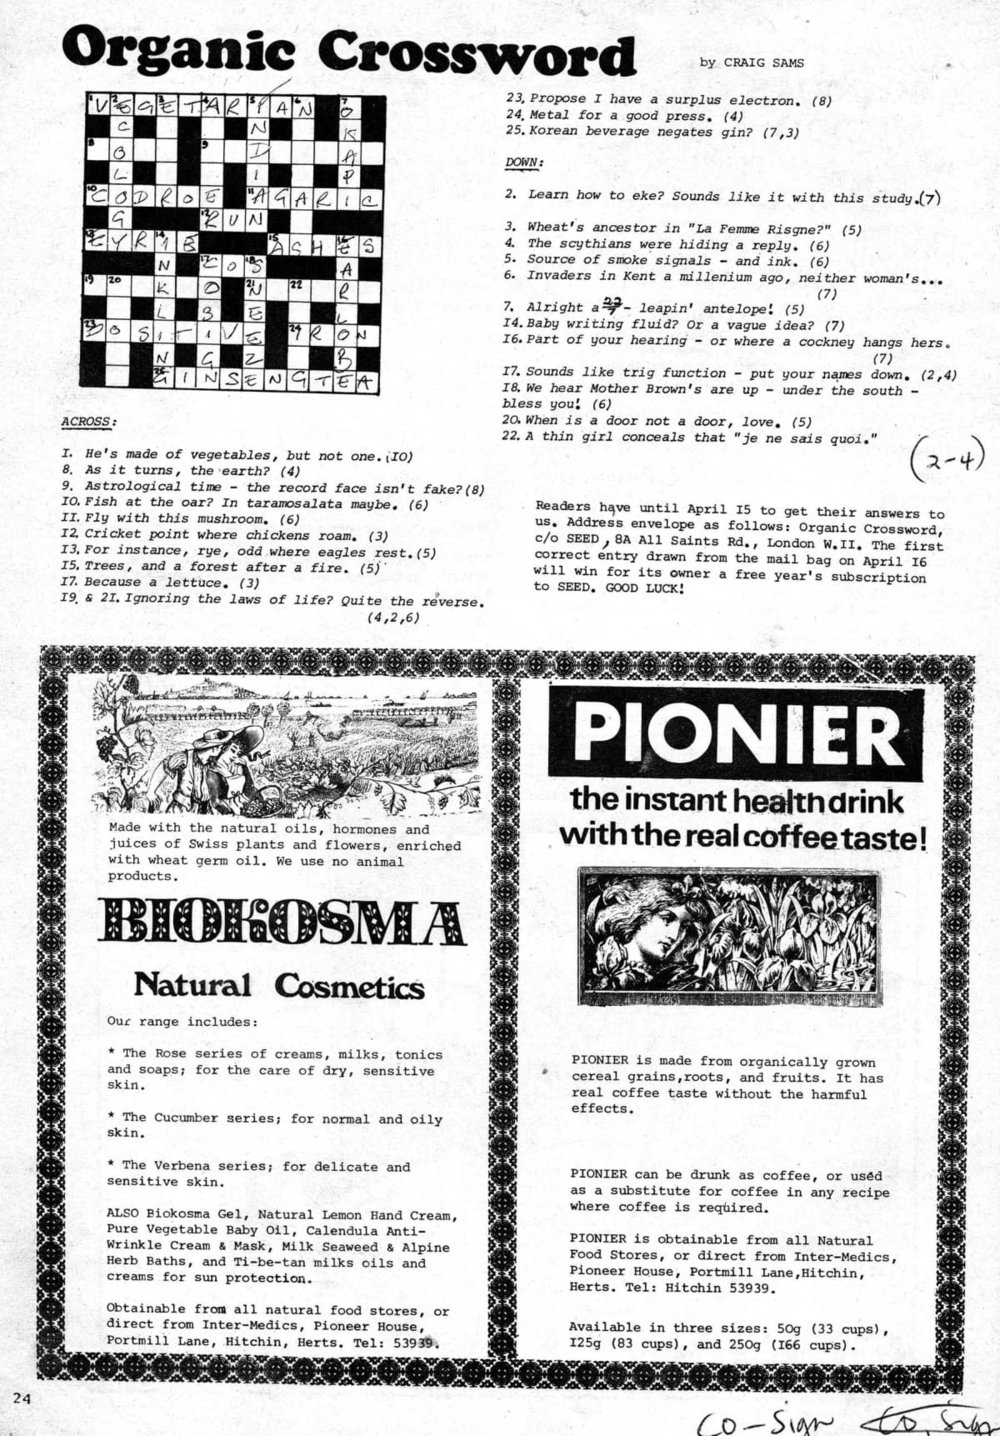 seed-v4-n4-april1975-24.jpg